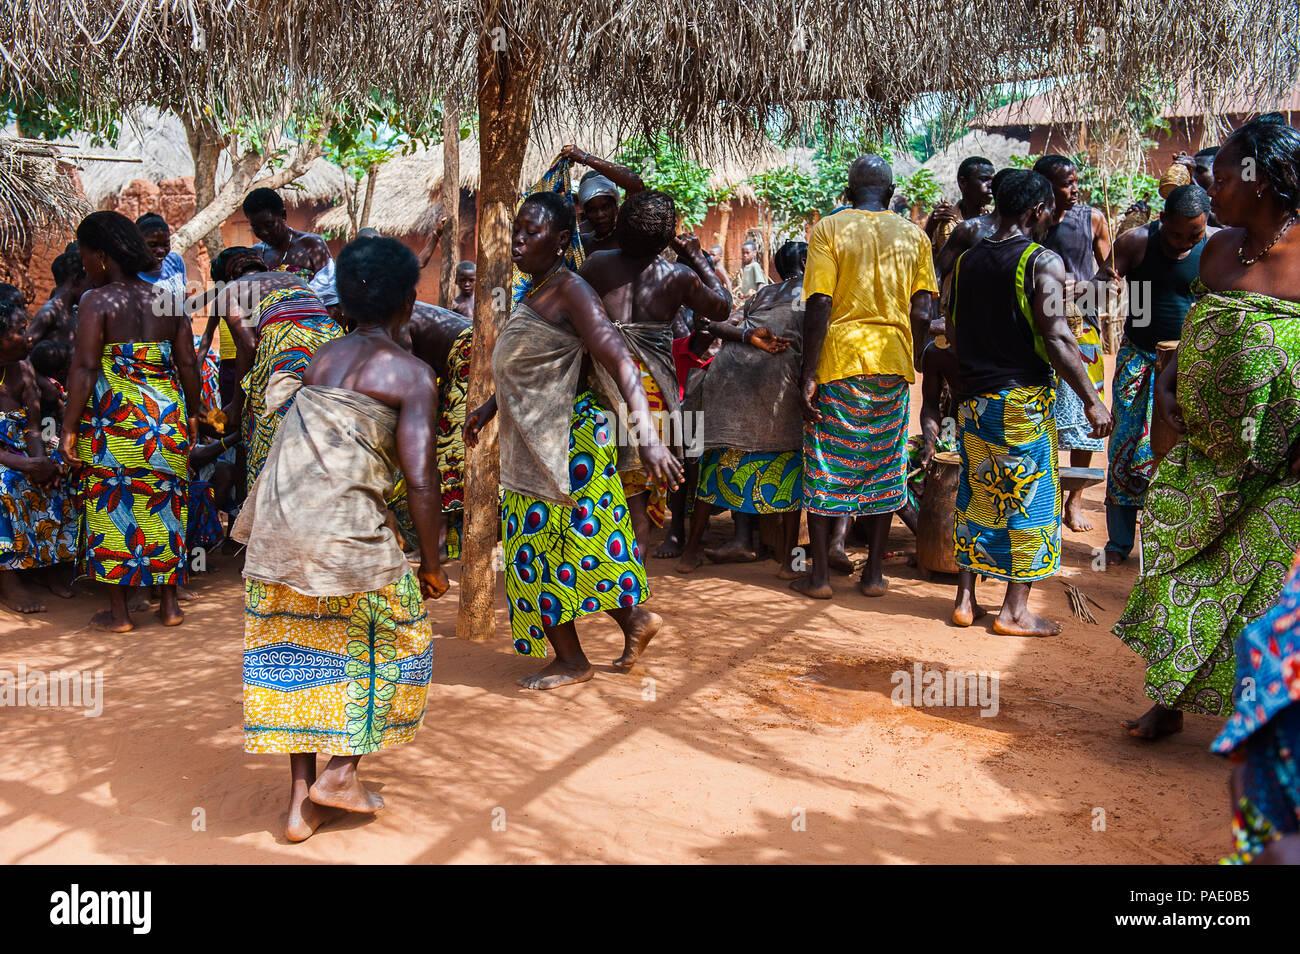 KARA, TOGO - MAR 11, 2012: Unidentified Togolese women in a